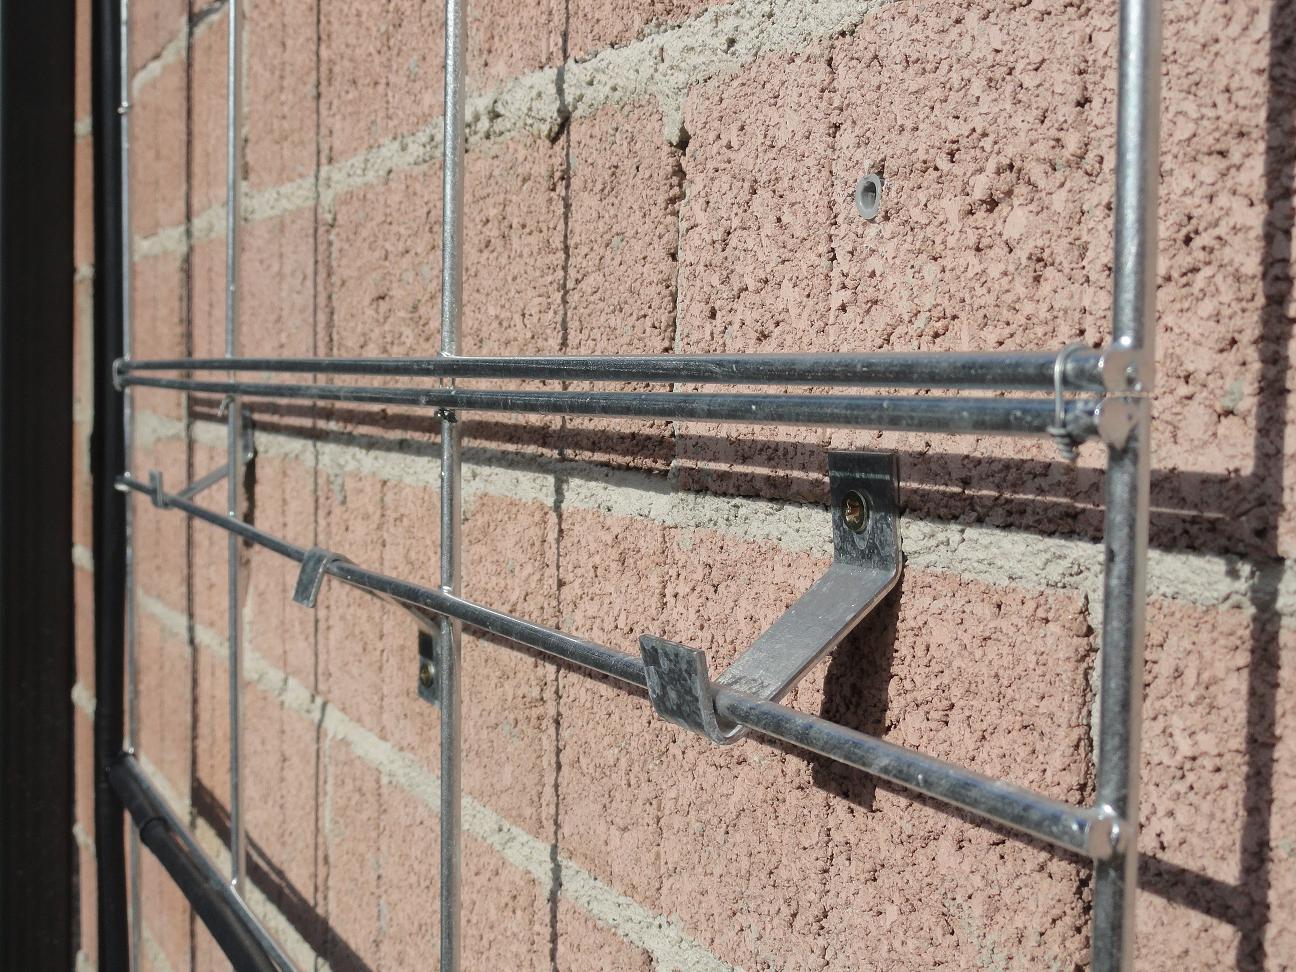 Vertiflor detalles constructivos - Estructura jardin vertical ...